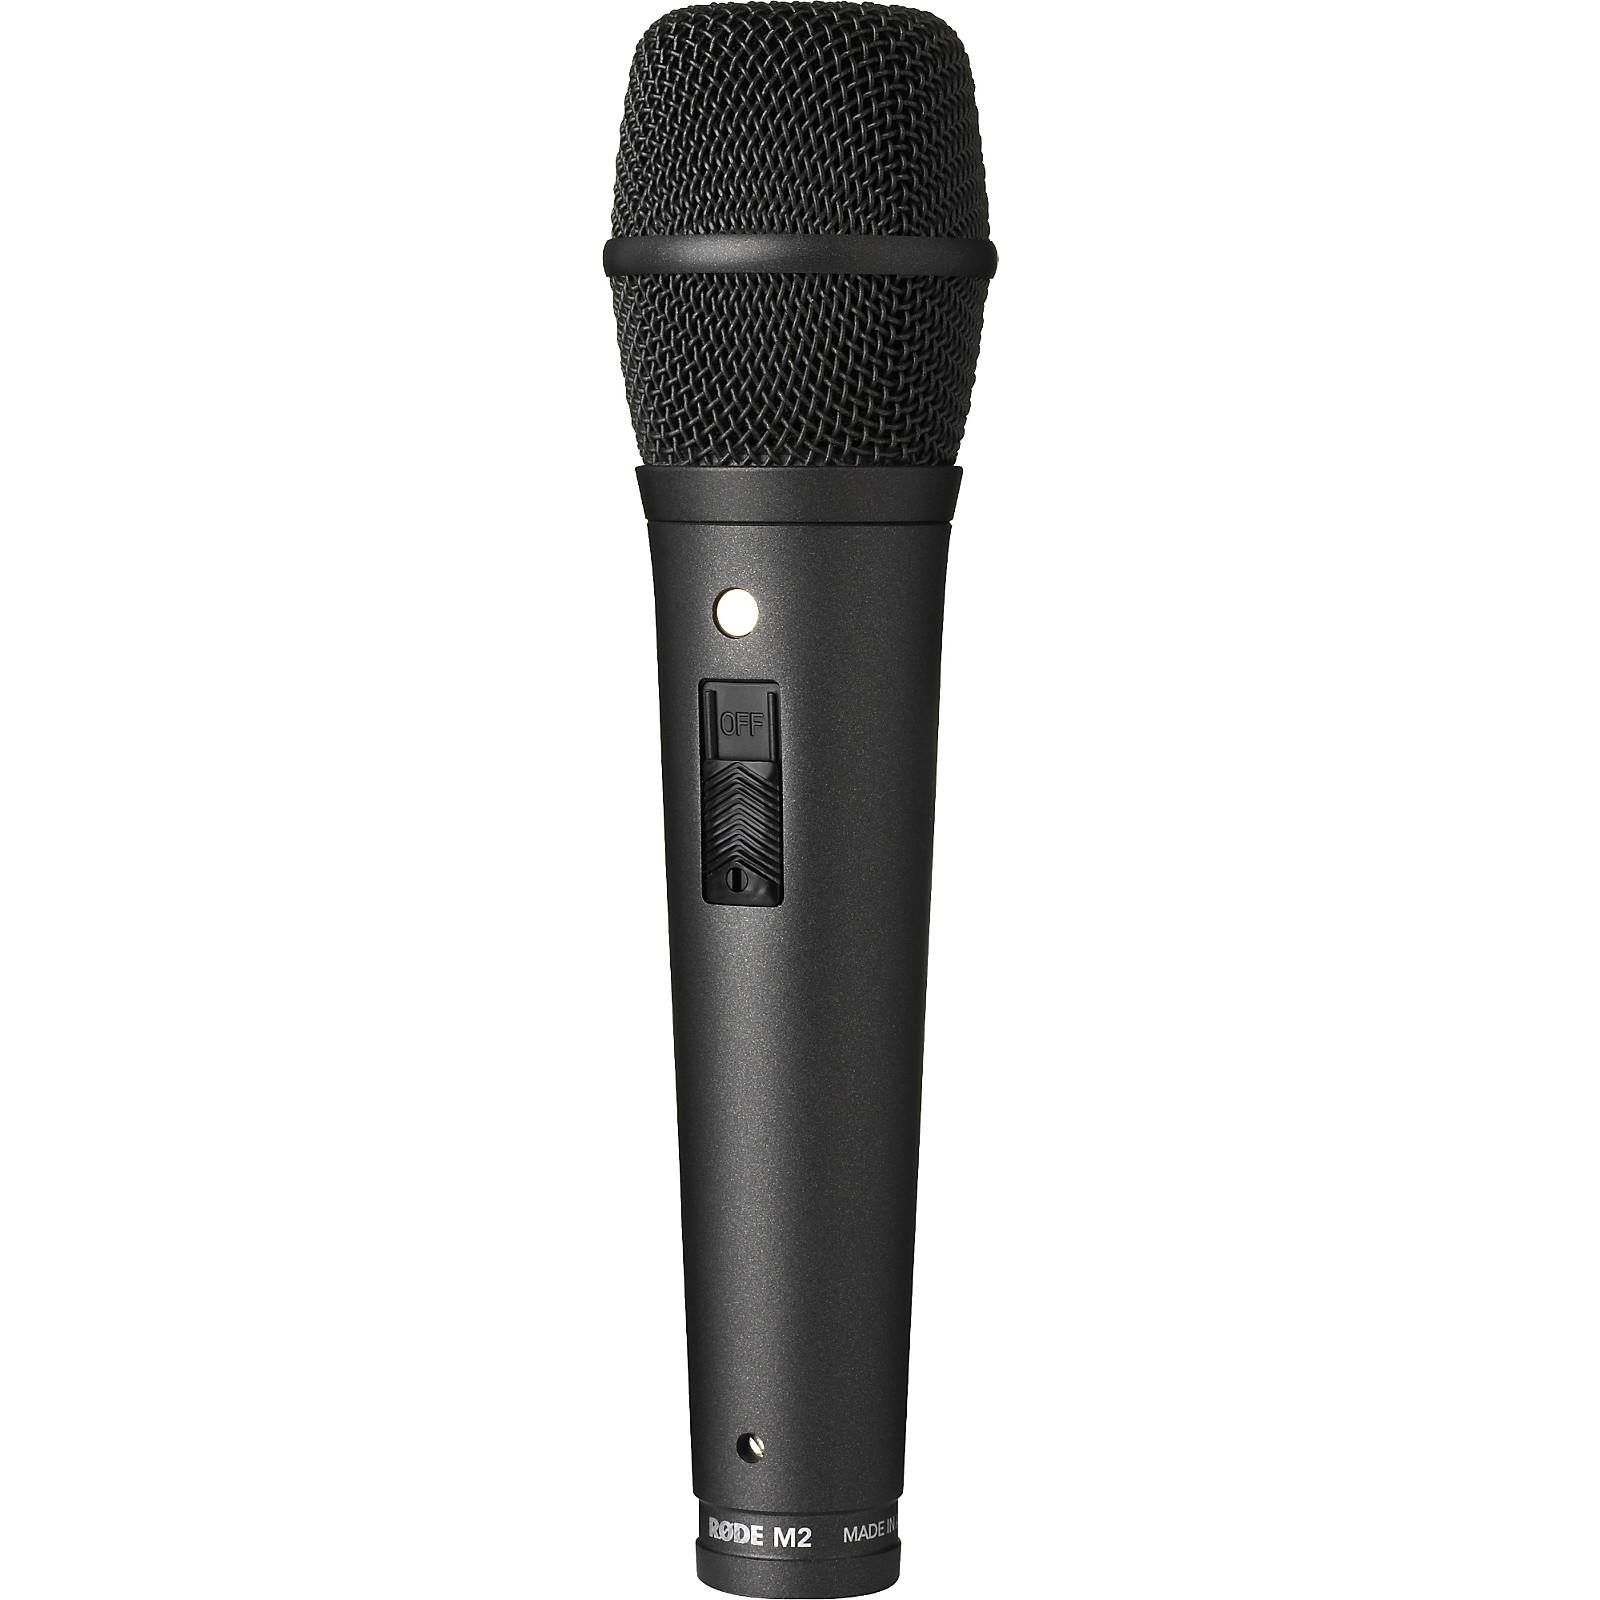 Open Box Rode M2 Handheld Condenser Microphone